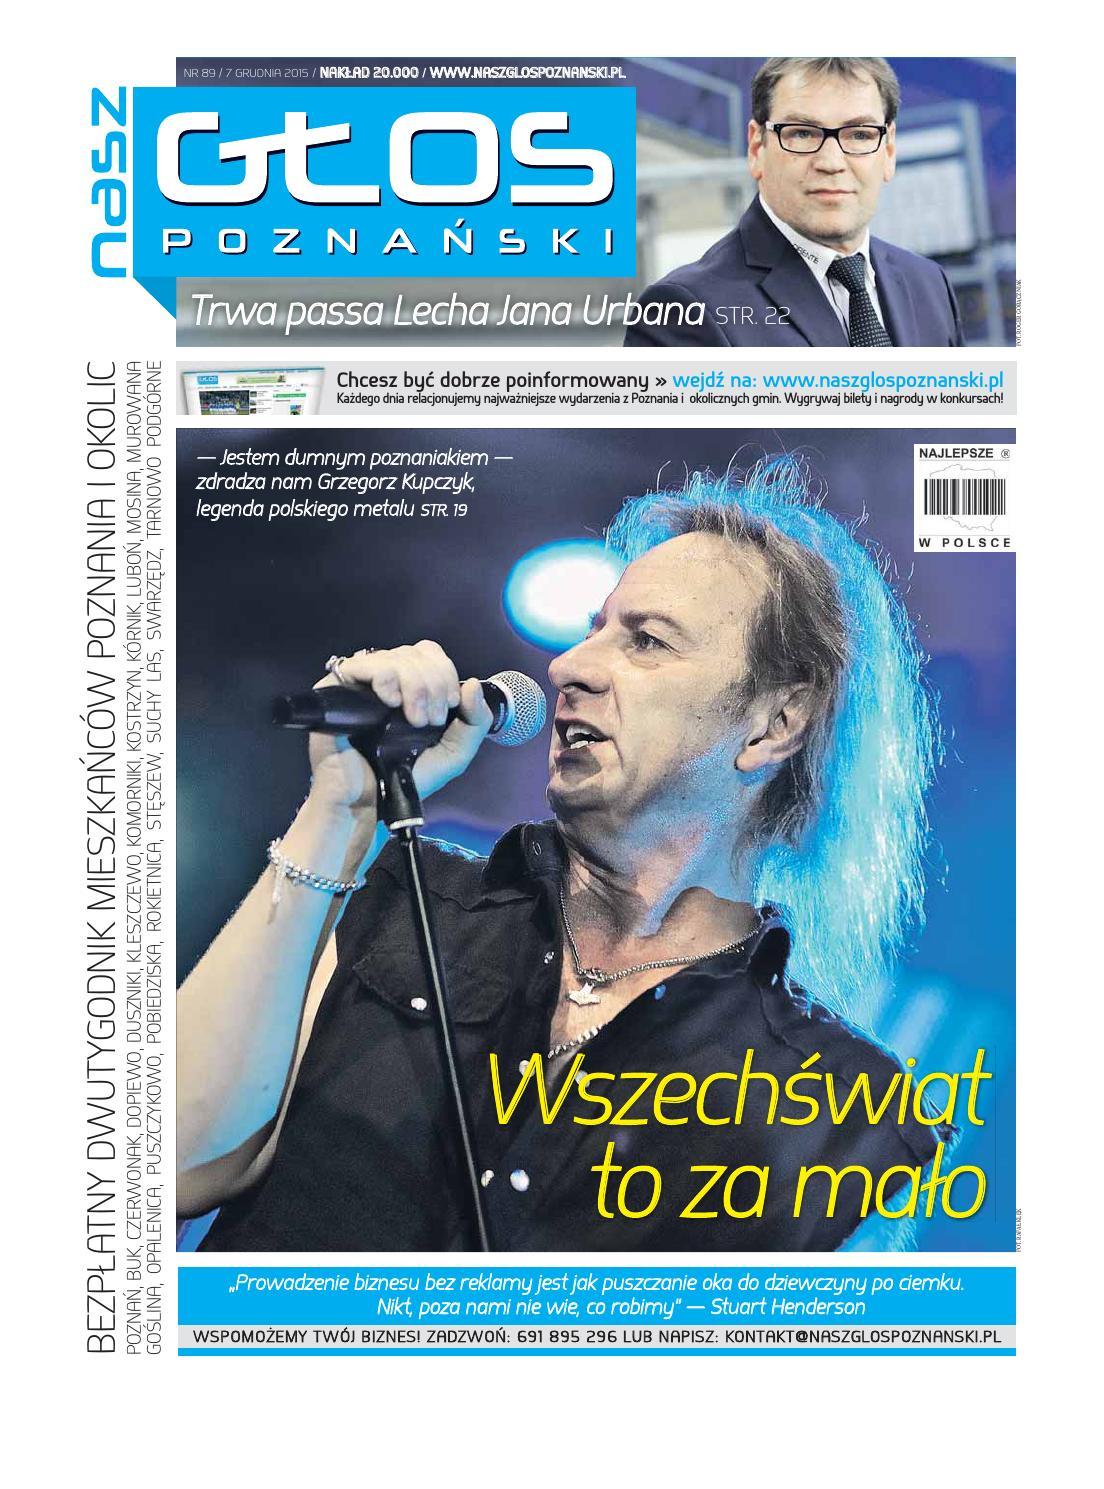 Quizy Murowana Golina - trendinfo.club